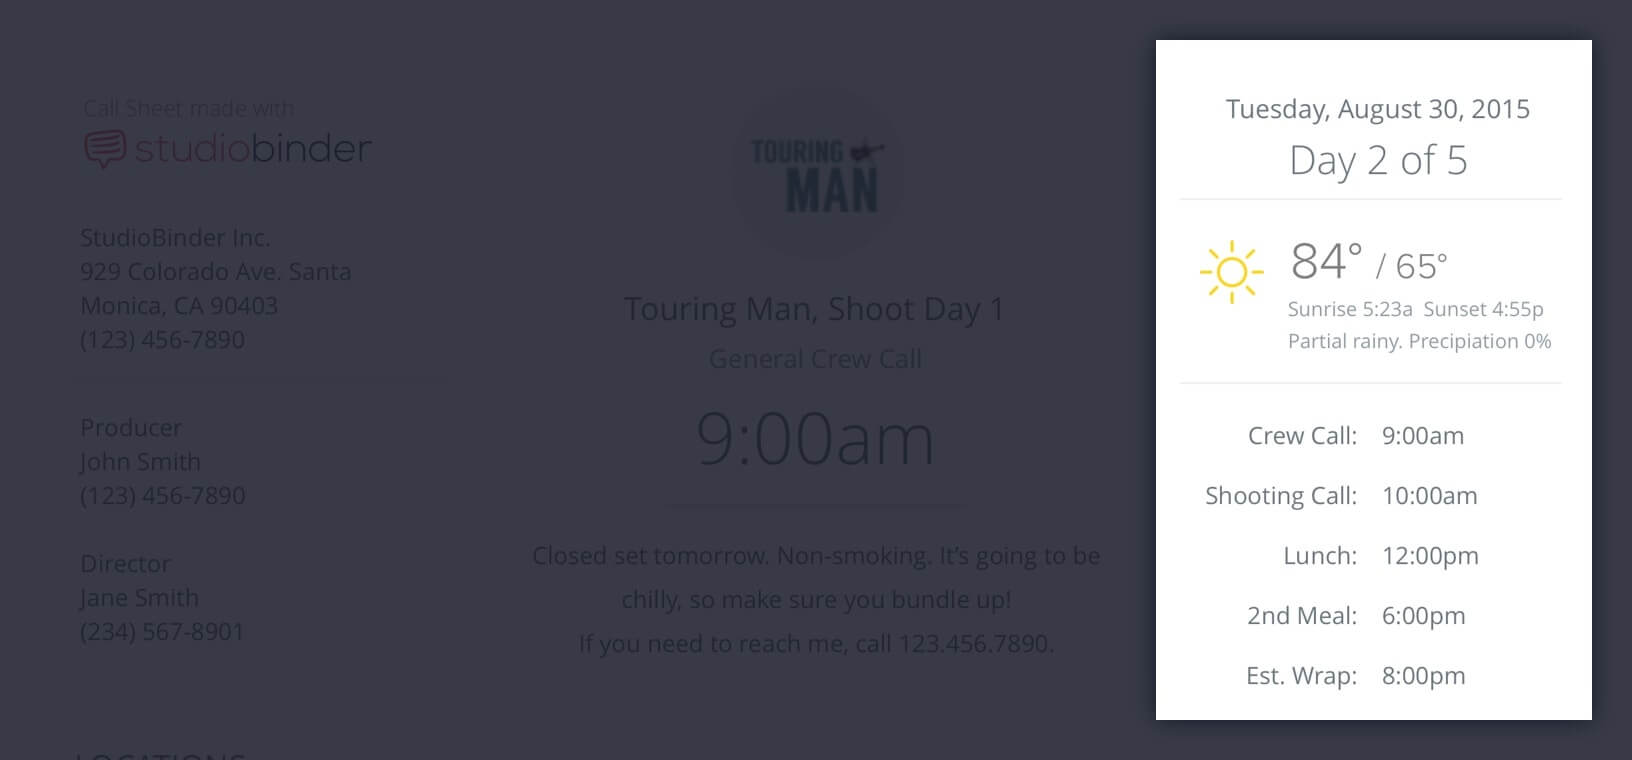 Callsheet Template Anatomy - Day of Days - Weather - Schedule - StudioBinder